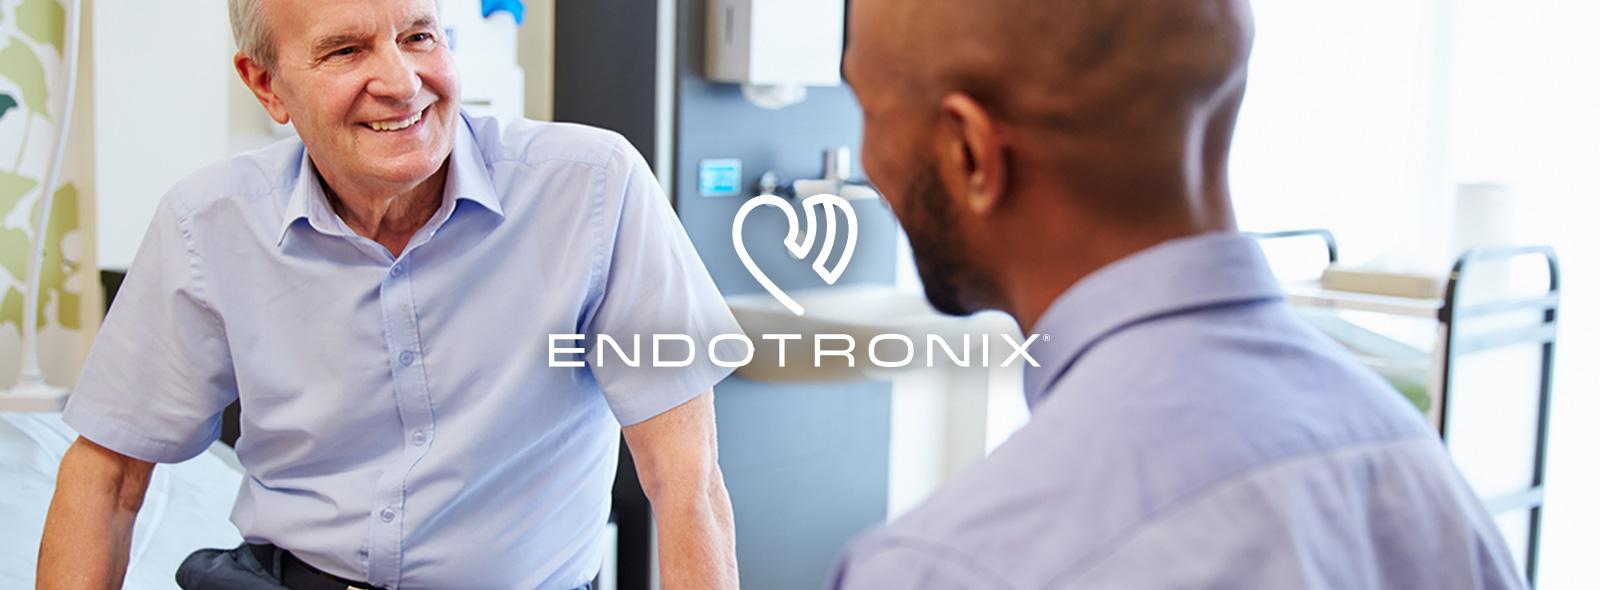 Endotronix Website Header